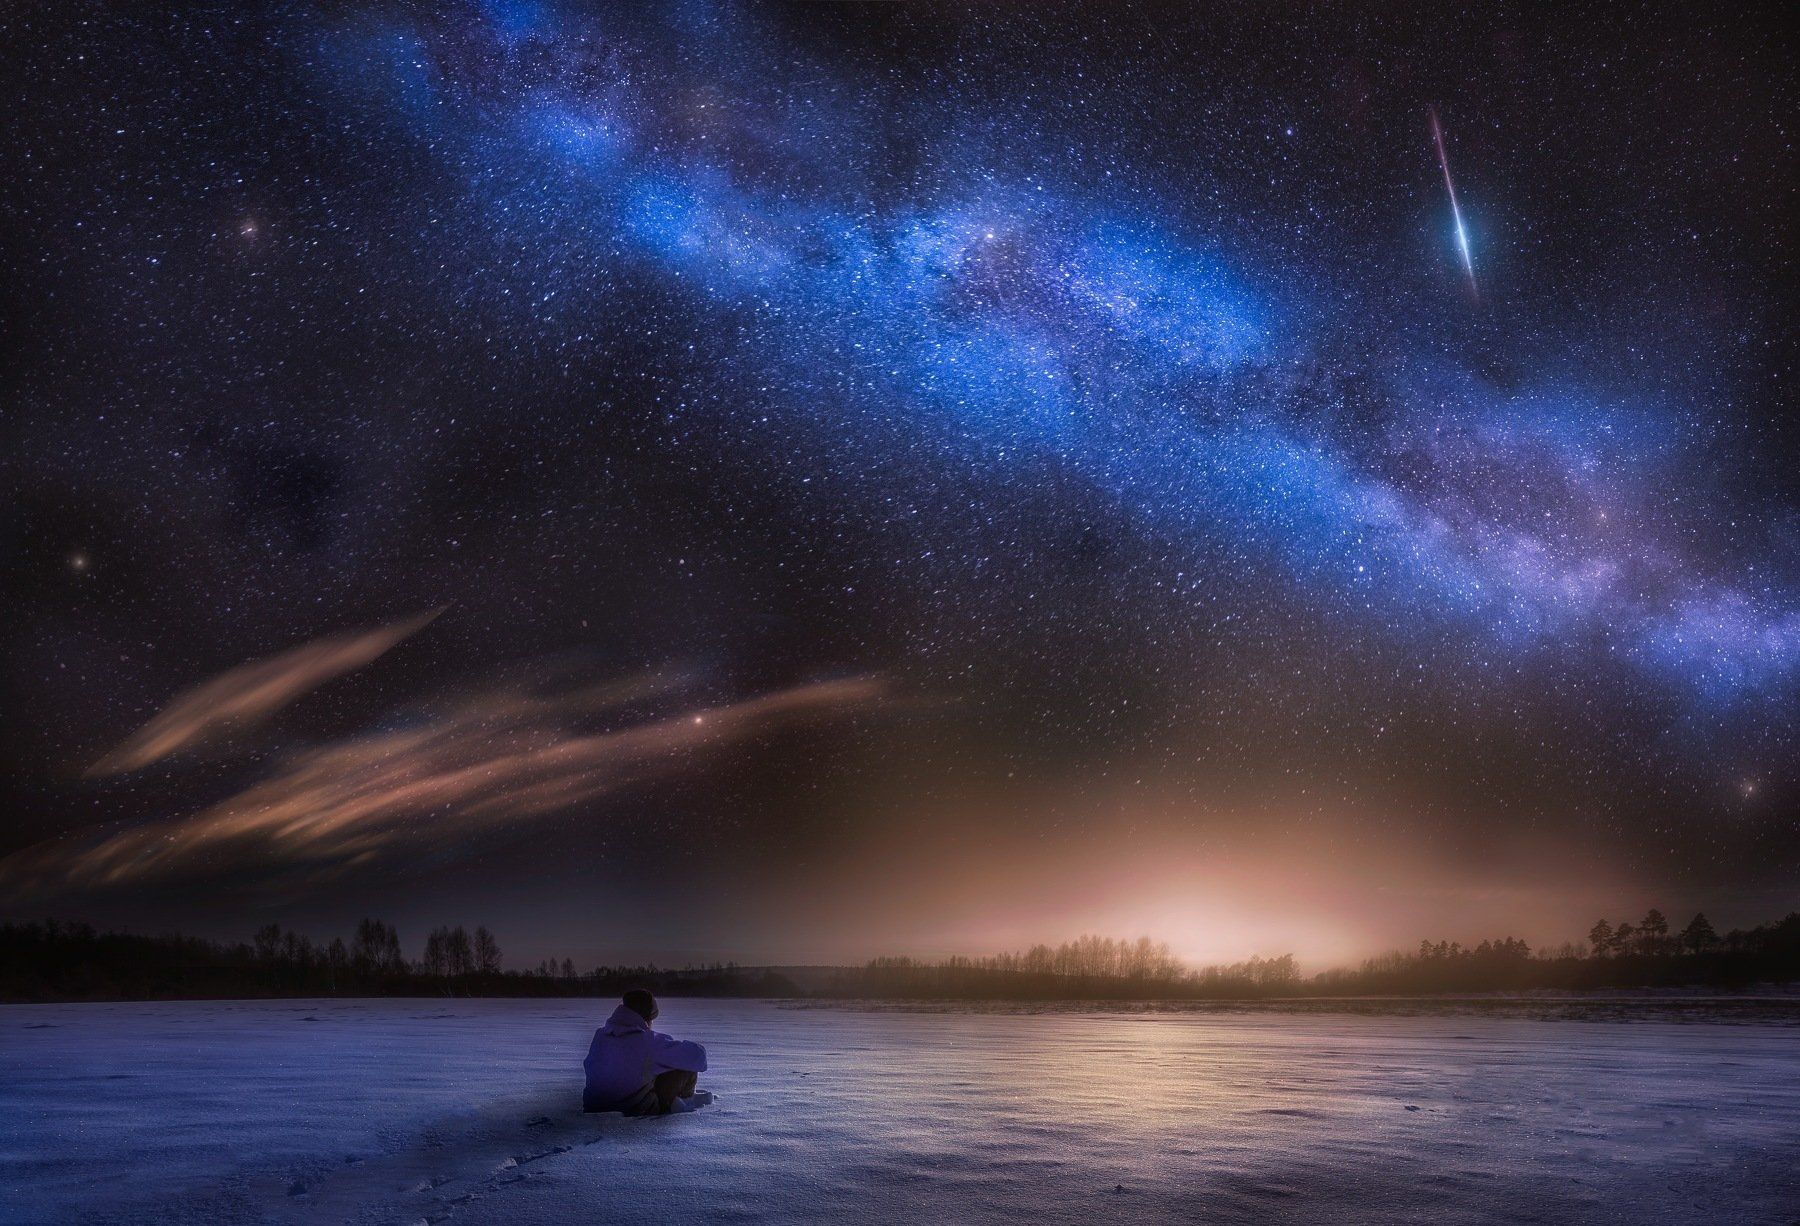 observer, night sky, milky way, winter, man, sitting, snow, starry, stars, Milosz_G